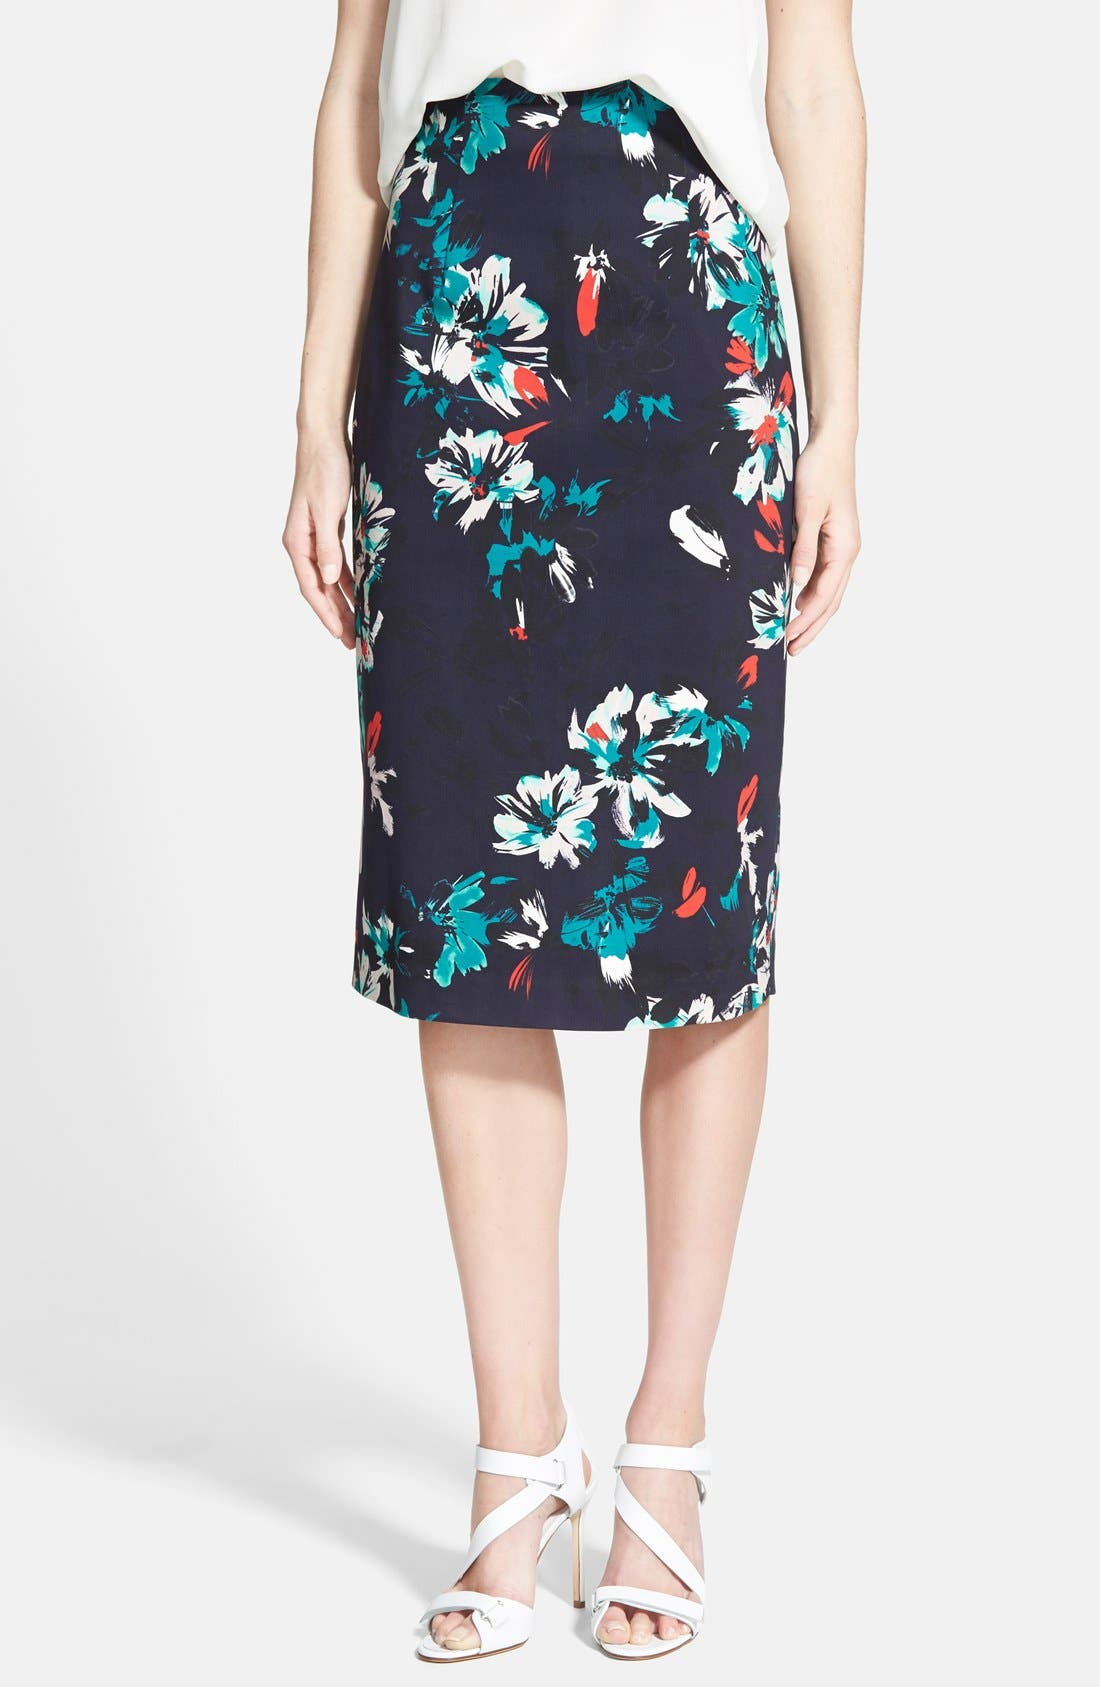 Alternate Image 1 Selected - Chelsea28 High Waist Floral Pencil Skirt